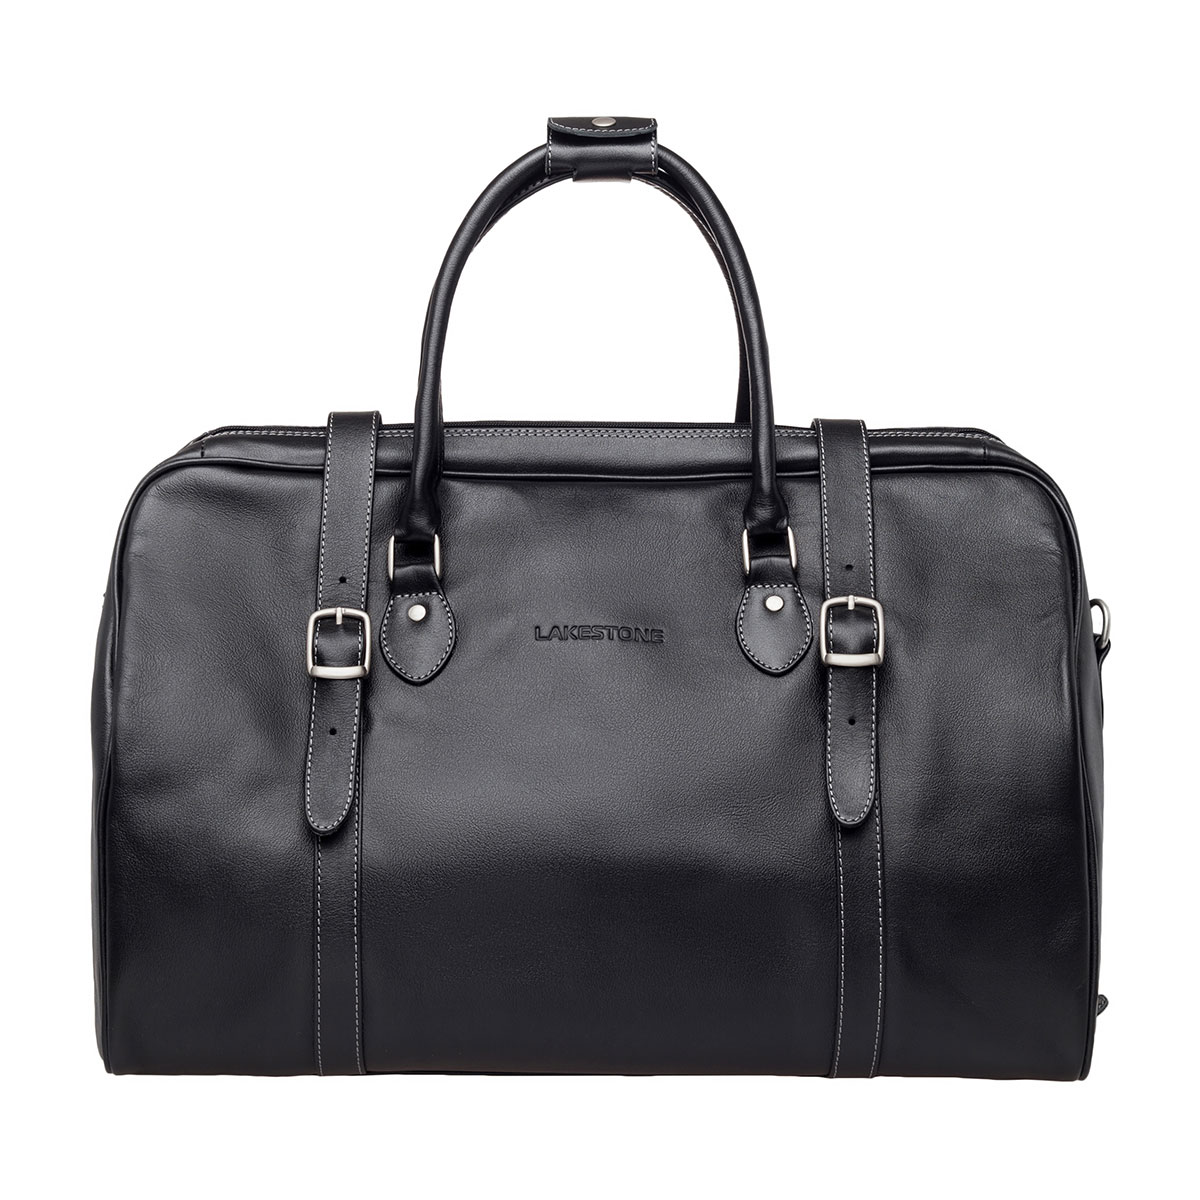 Дорожная кожаная сумка Sandford Black фото